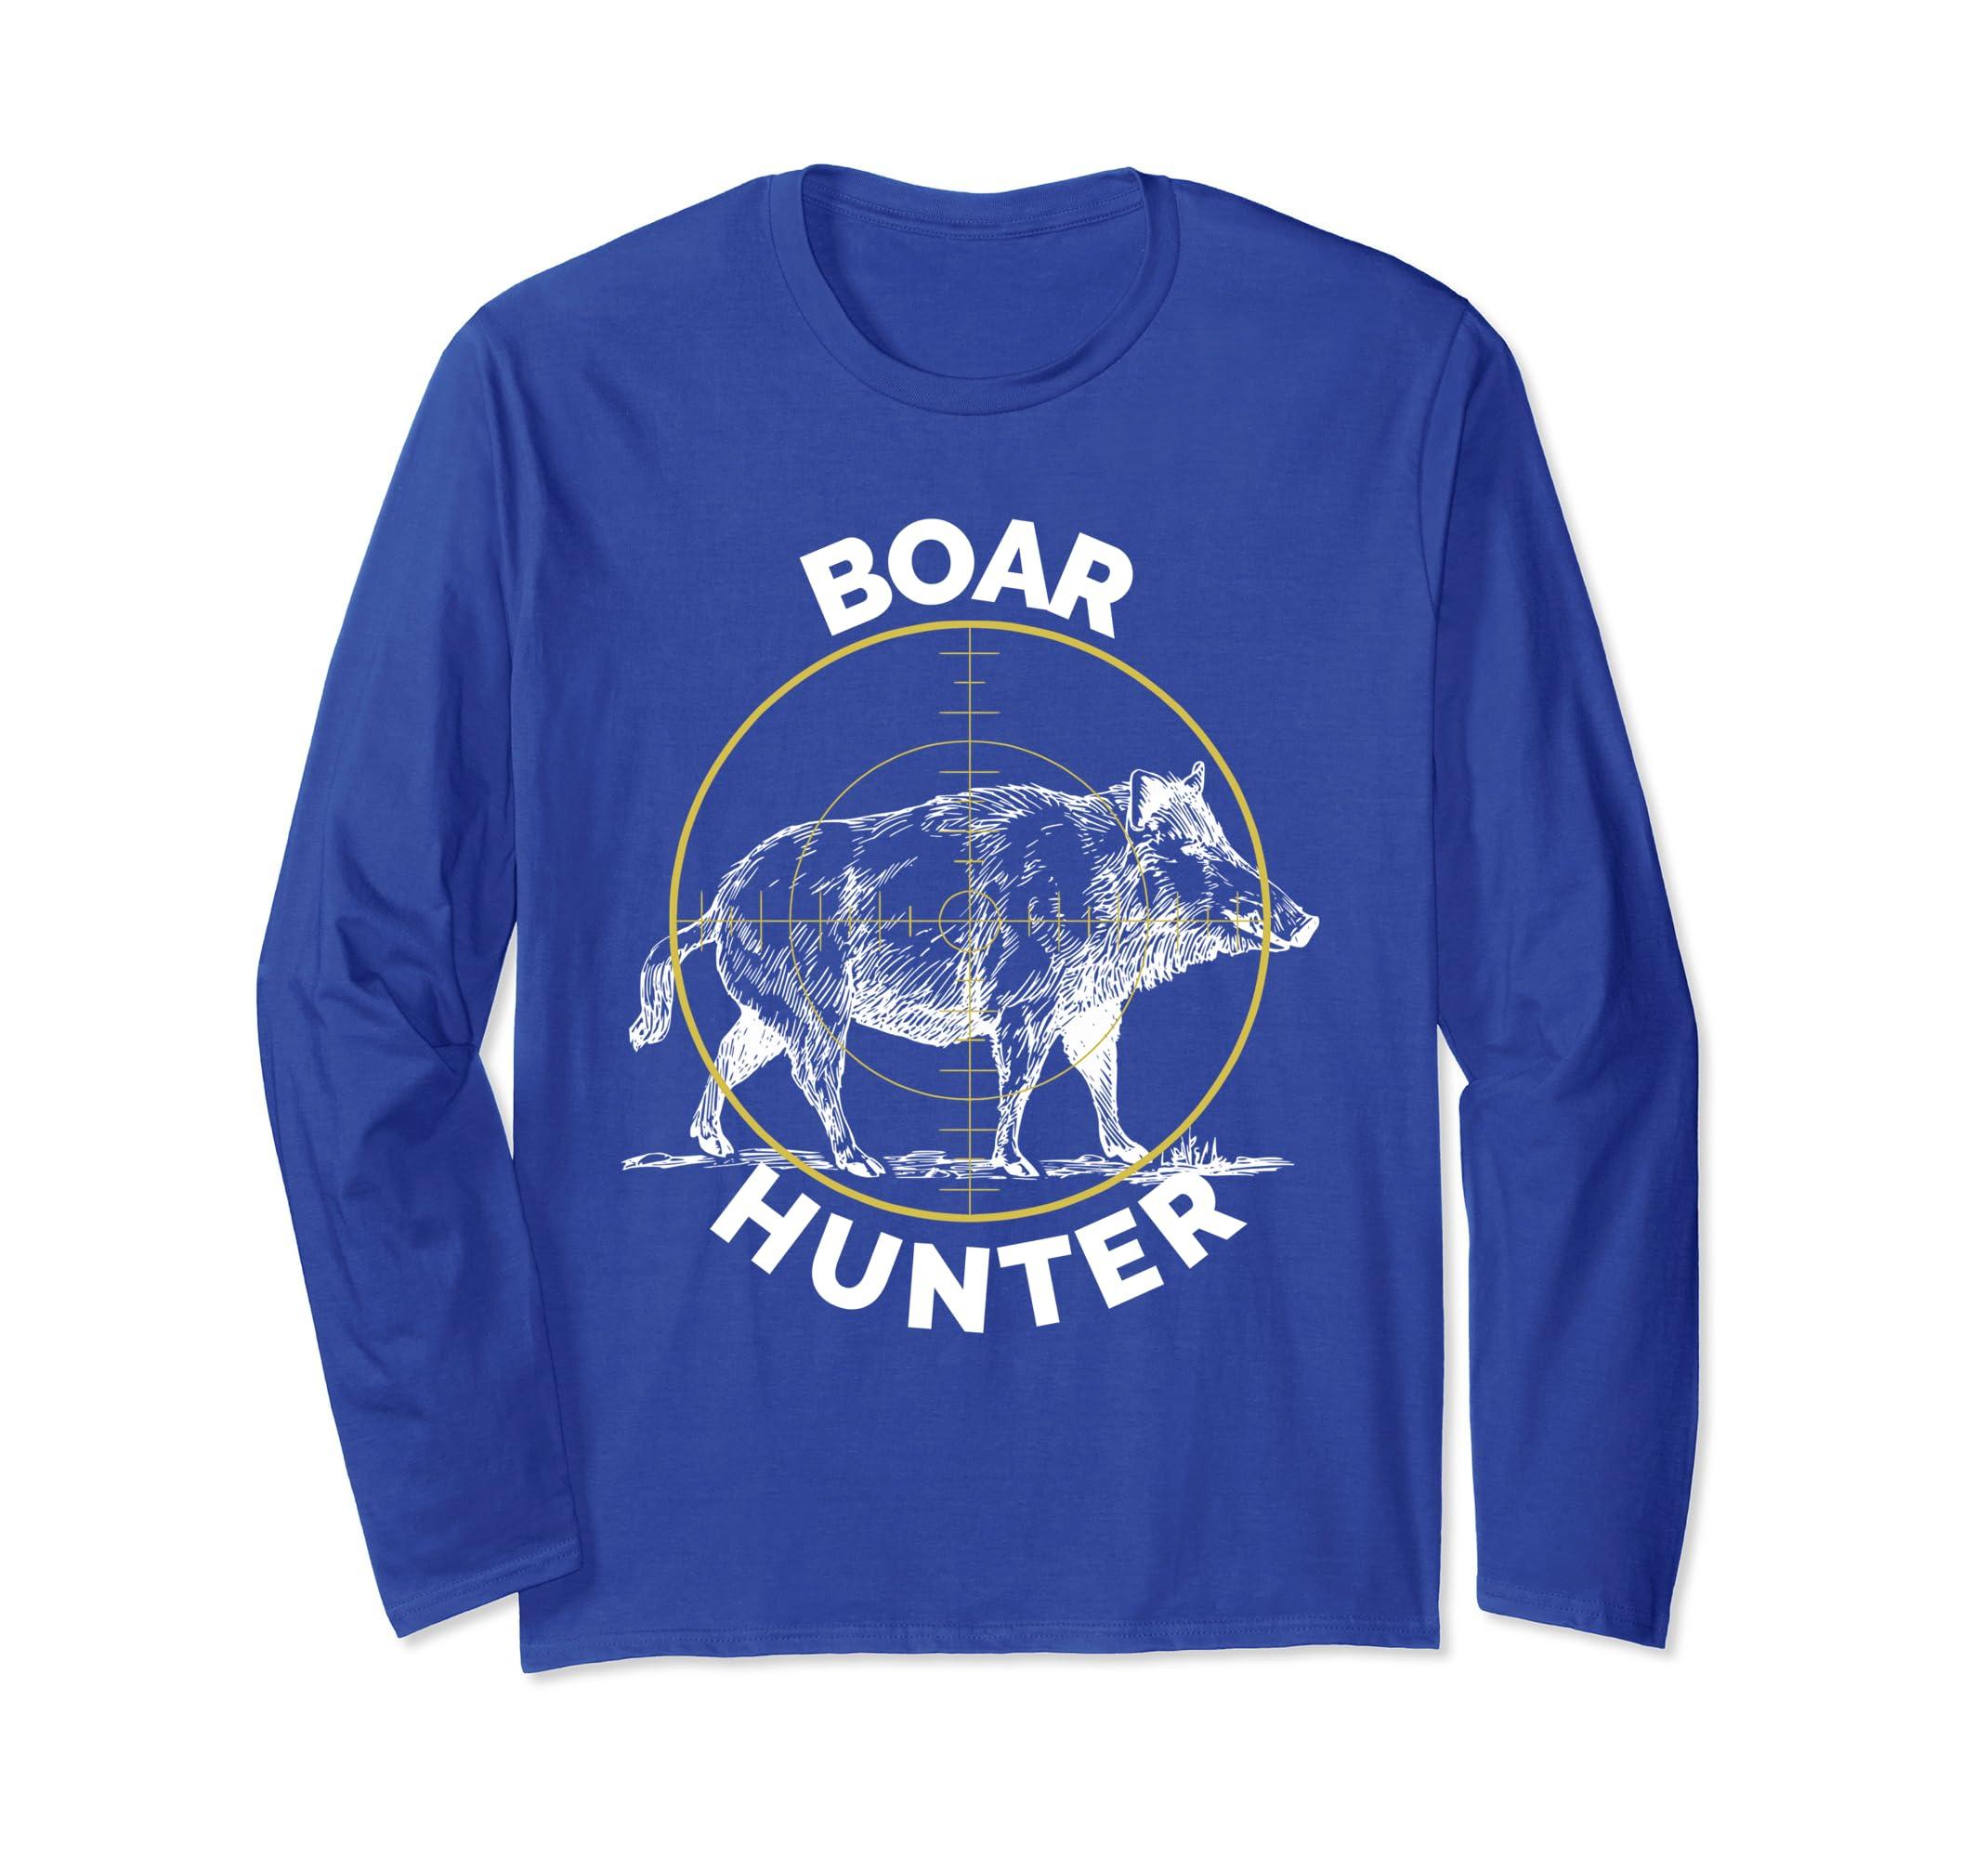 Boar Hunter Hog Hunting Sight Long Sleeve T Shirt Wild Pig-ln